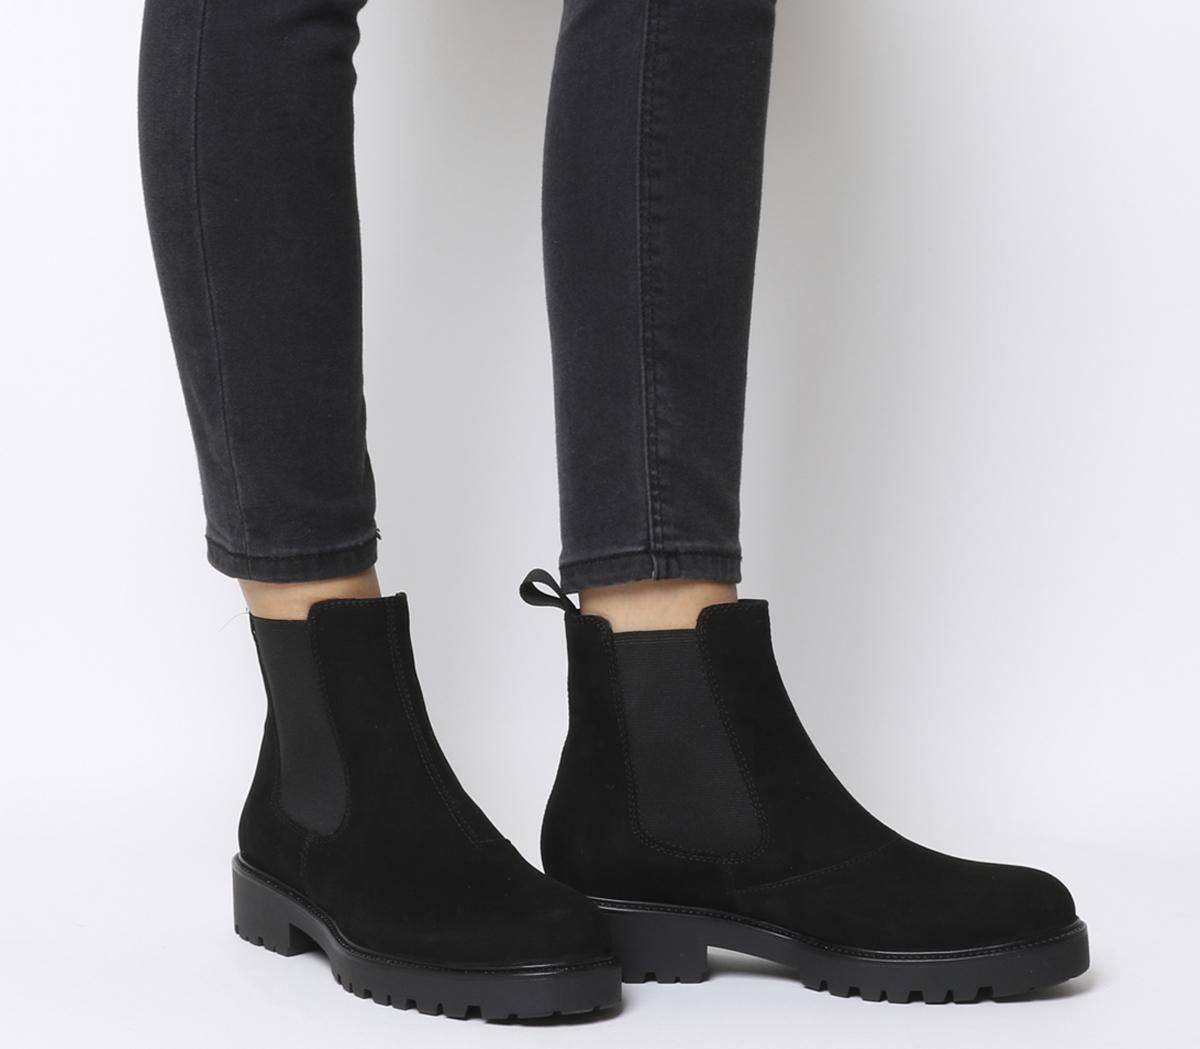 best sneakers 969cd 57da7 Details about Womens Vagabond Kenova Chelsea Boots Black Nubuck Boots